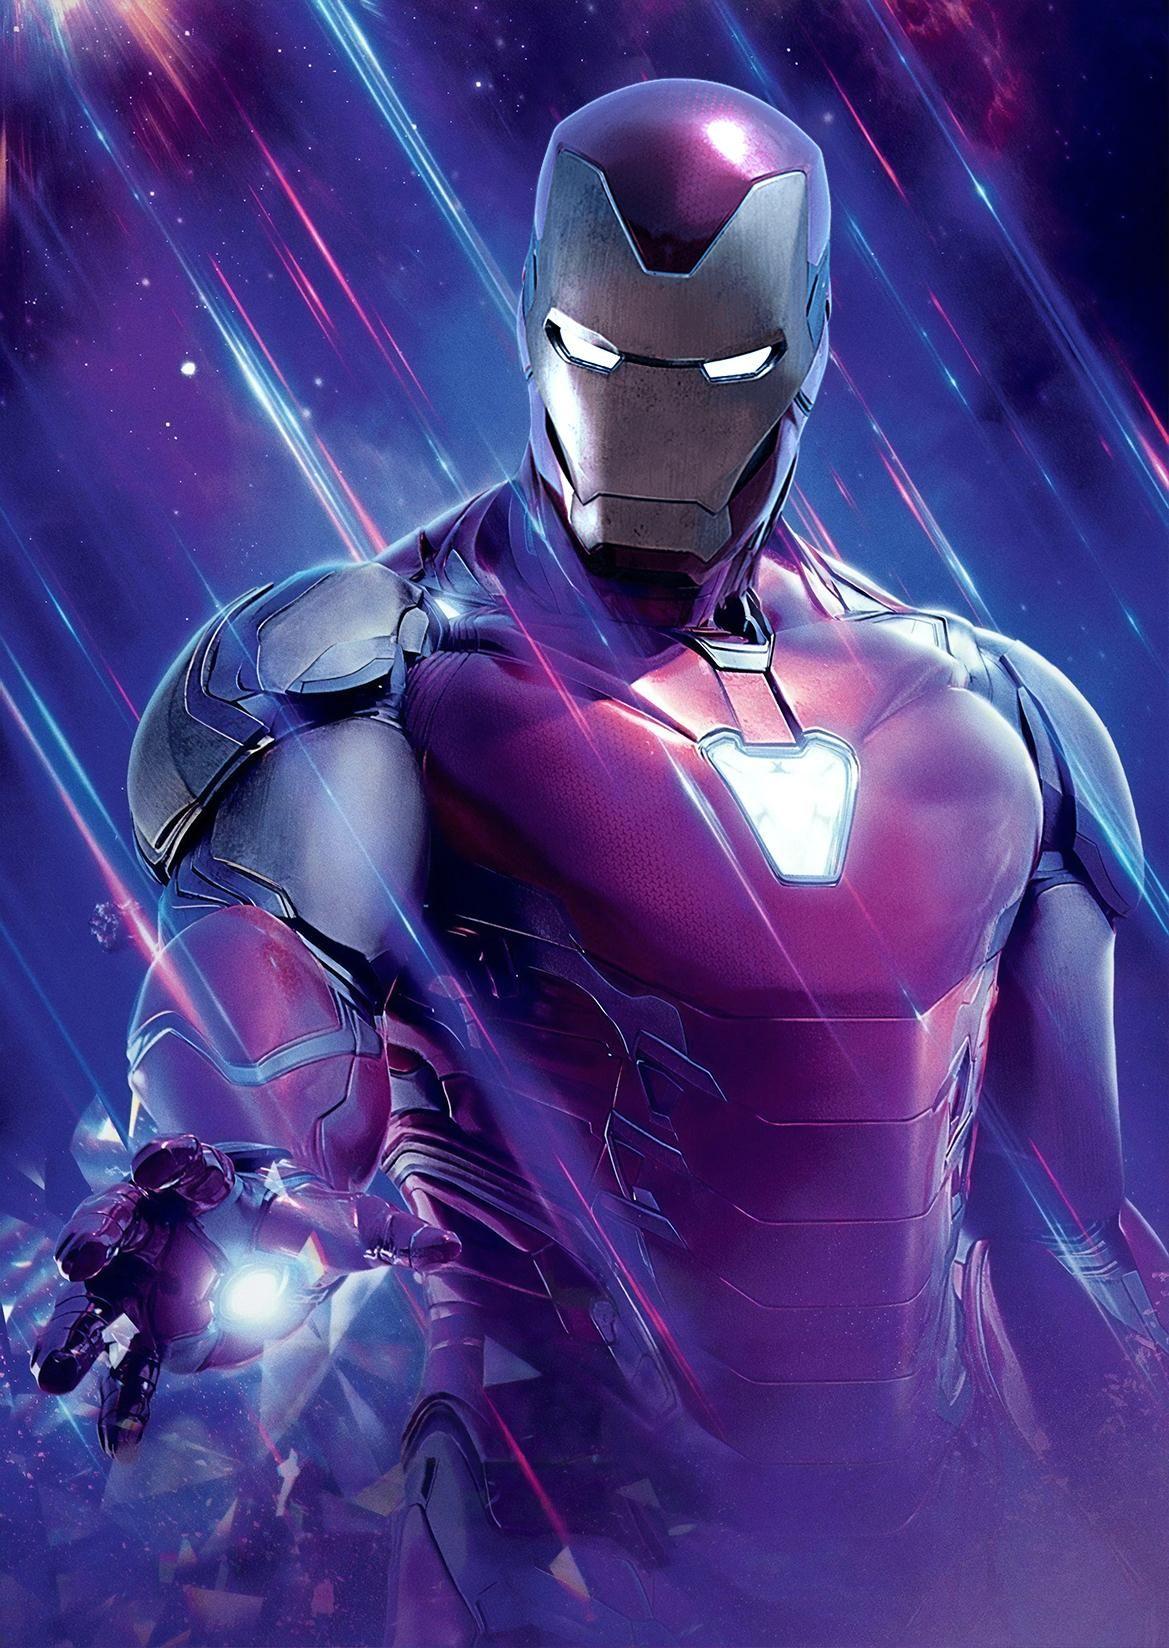 Iron man movies poster print metal posters iron man